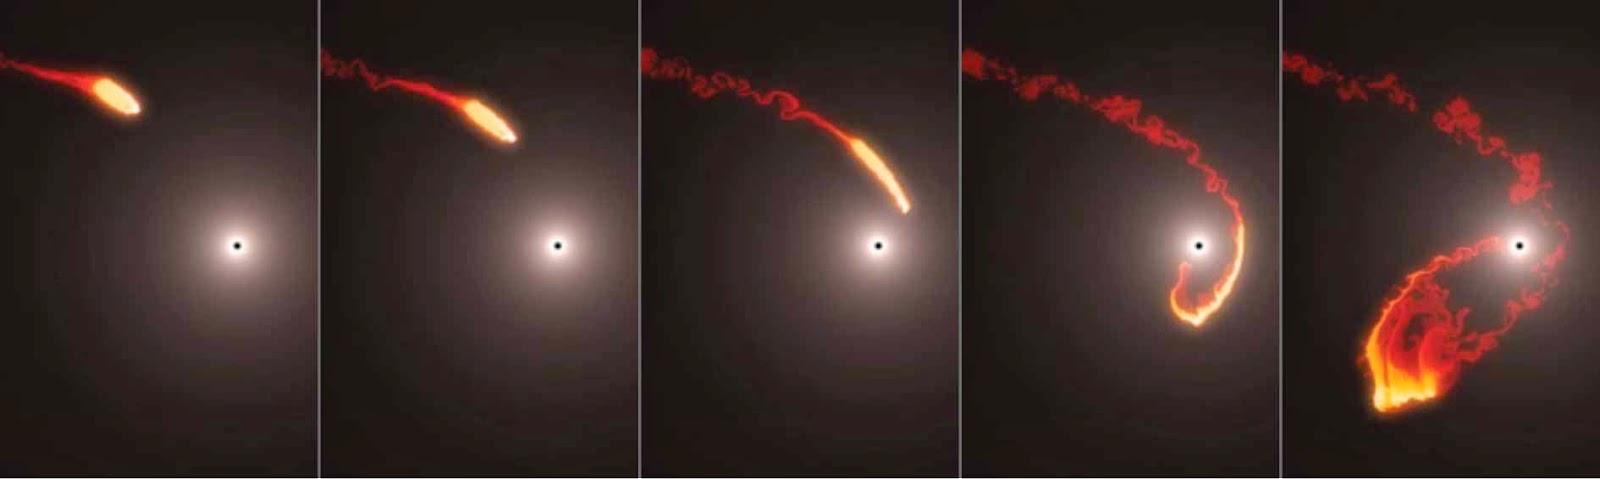 black hole universe creation - photo #7